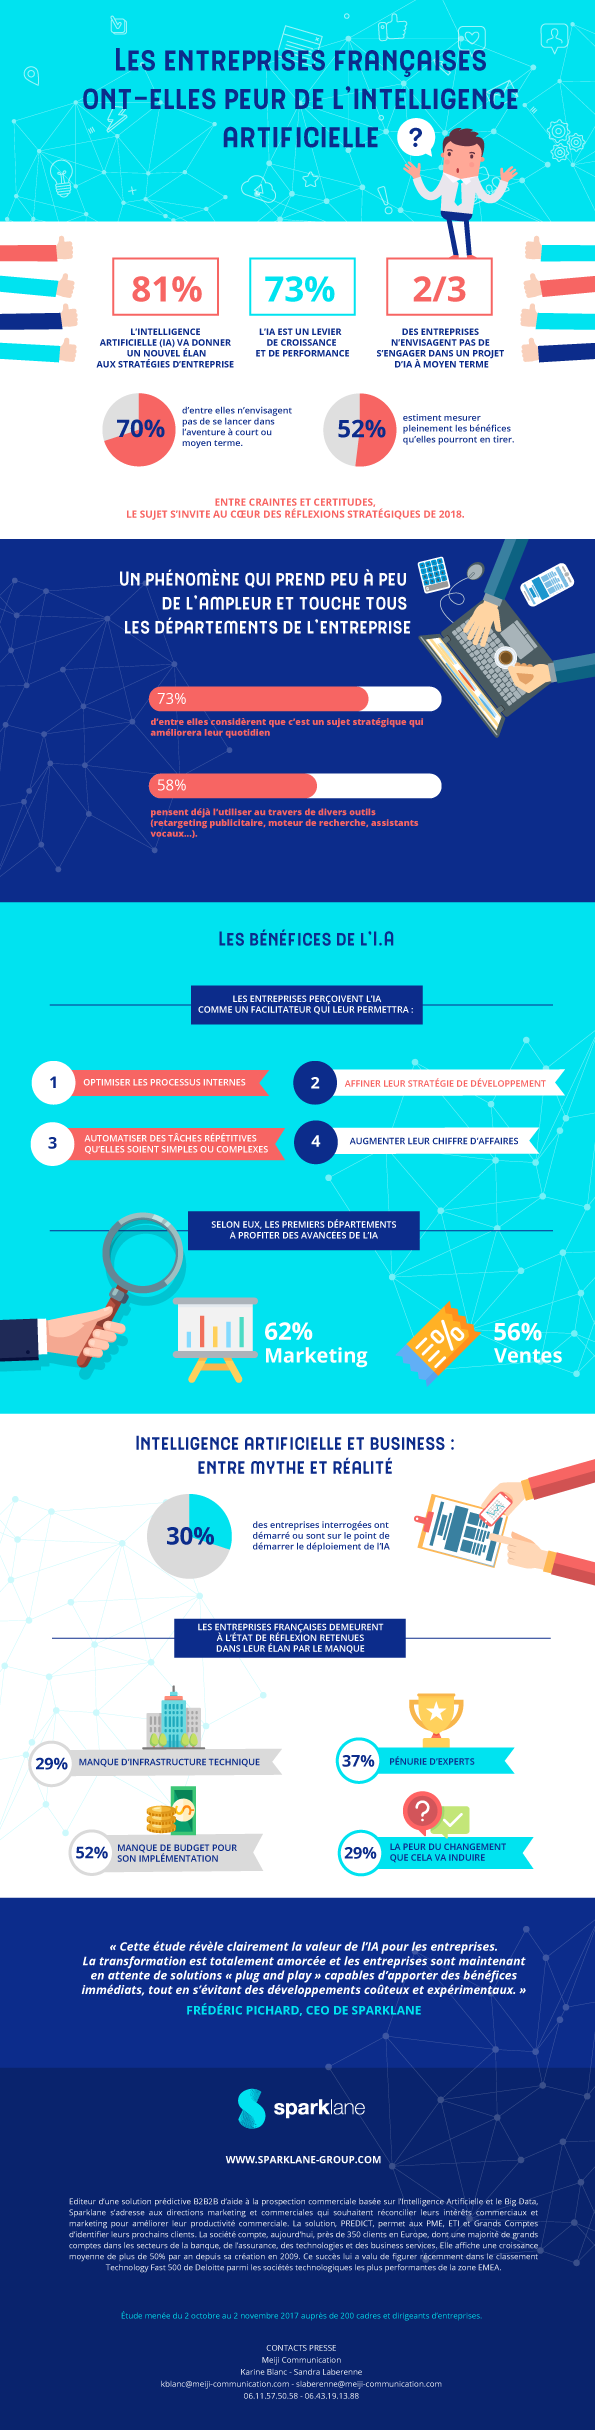 infographie, entreprise, IA